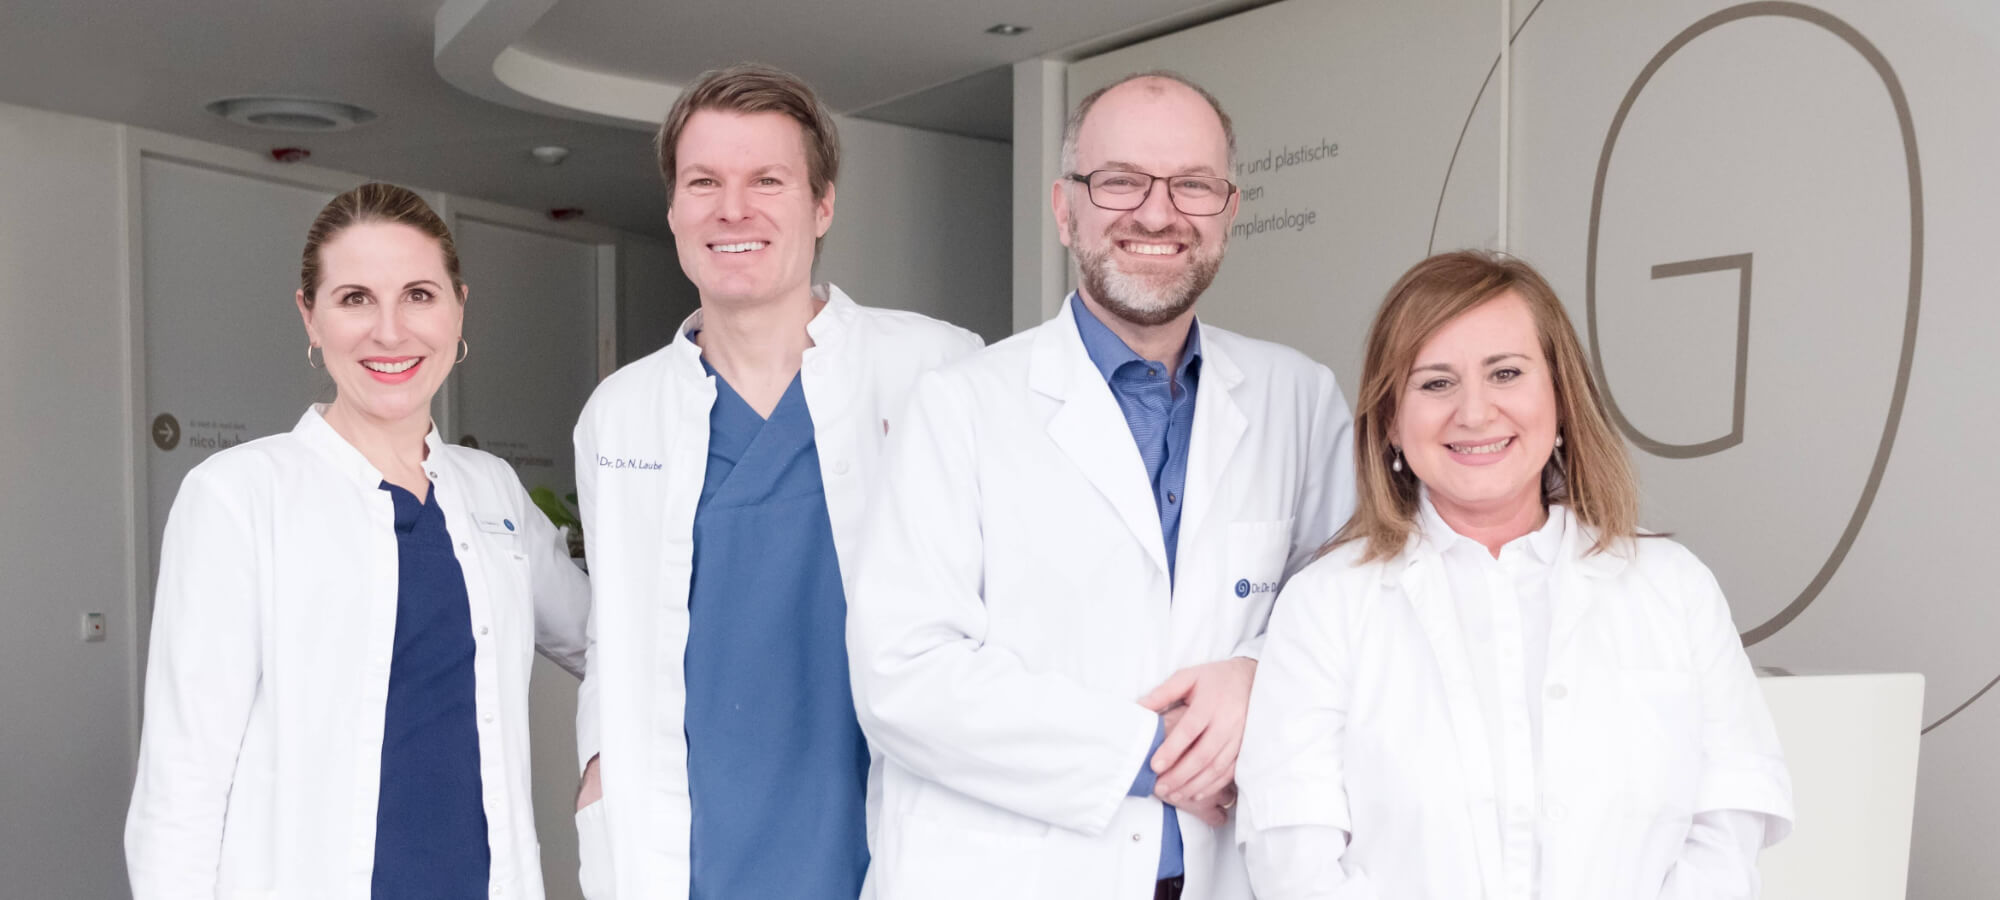 Ärzte Team | groisman & laube Frankfurt